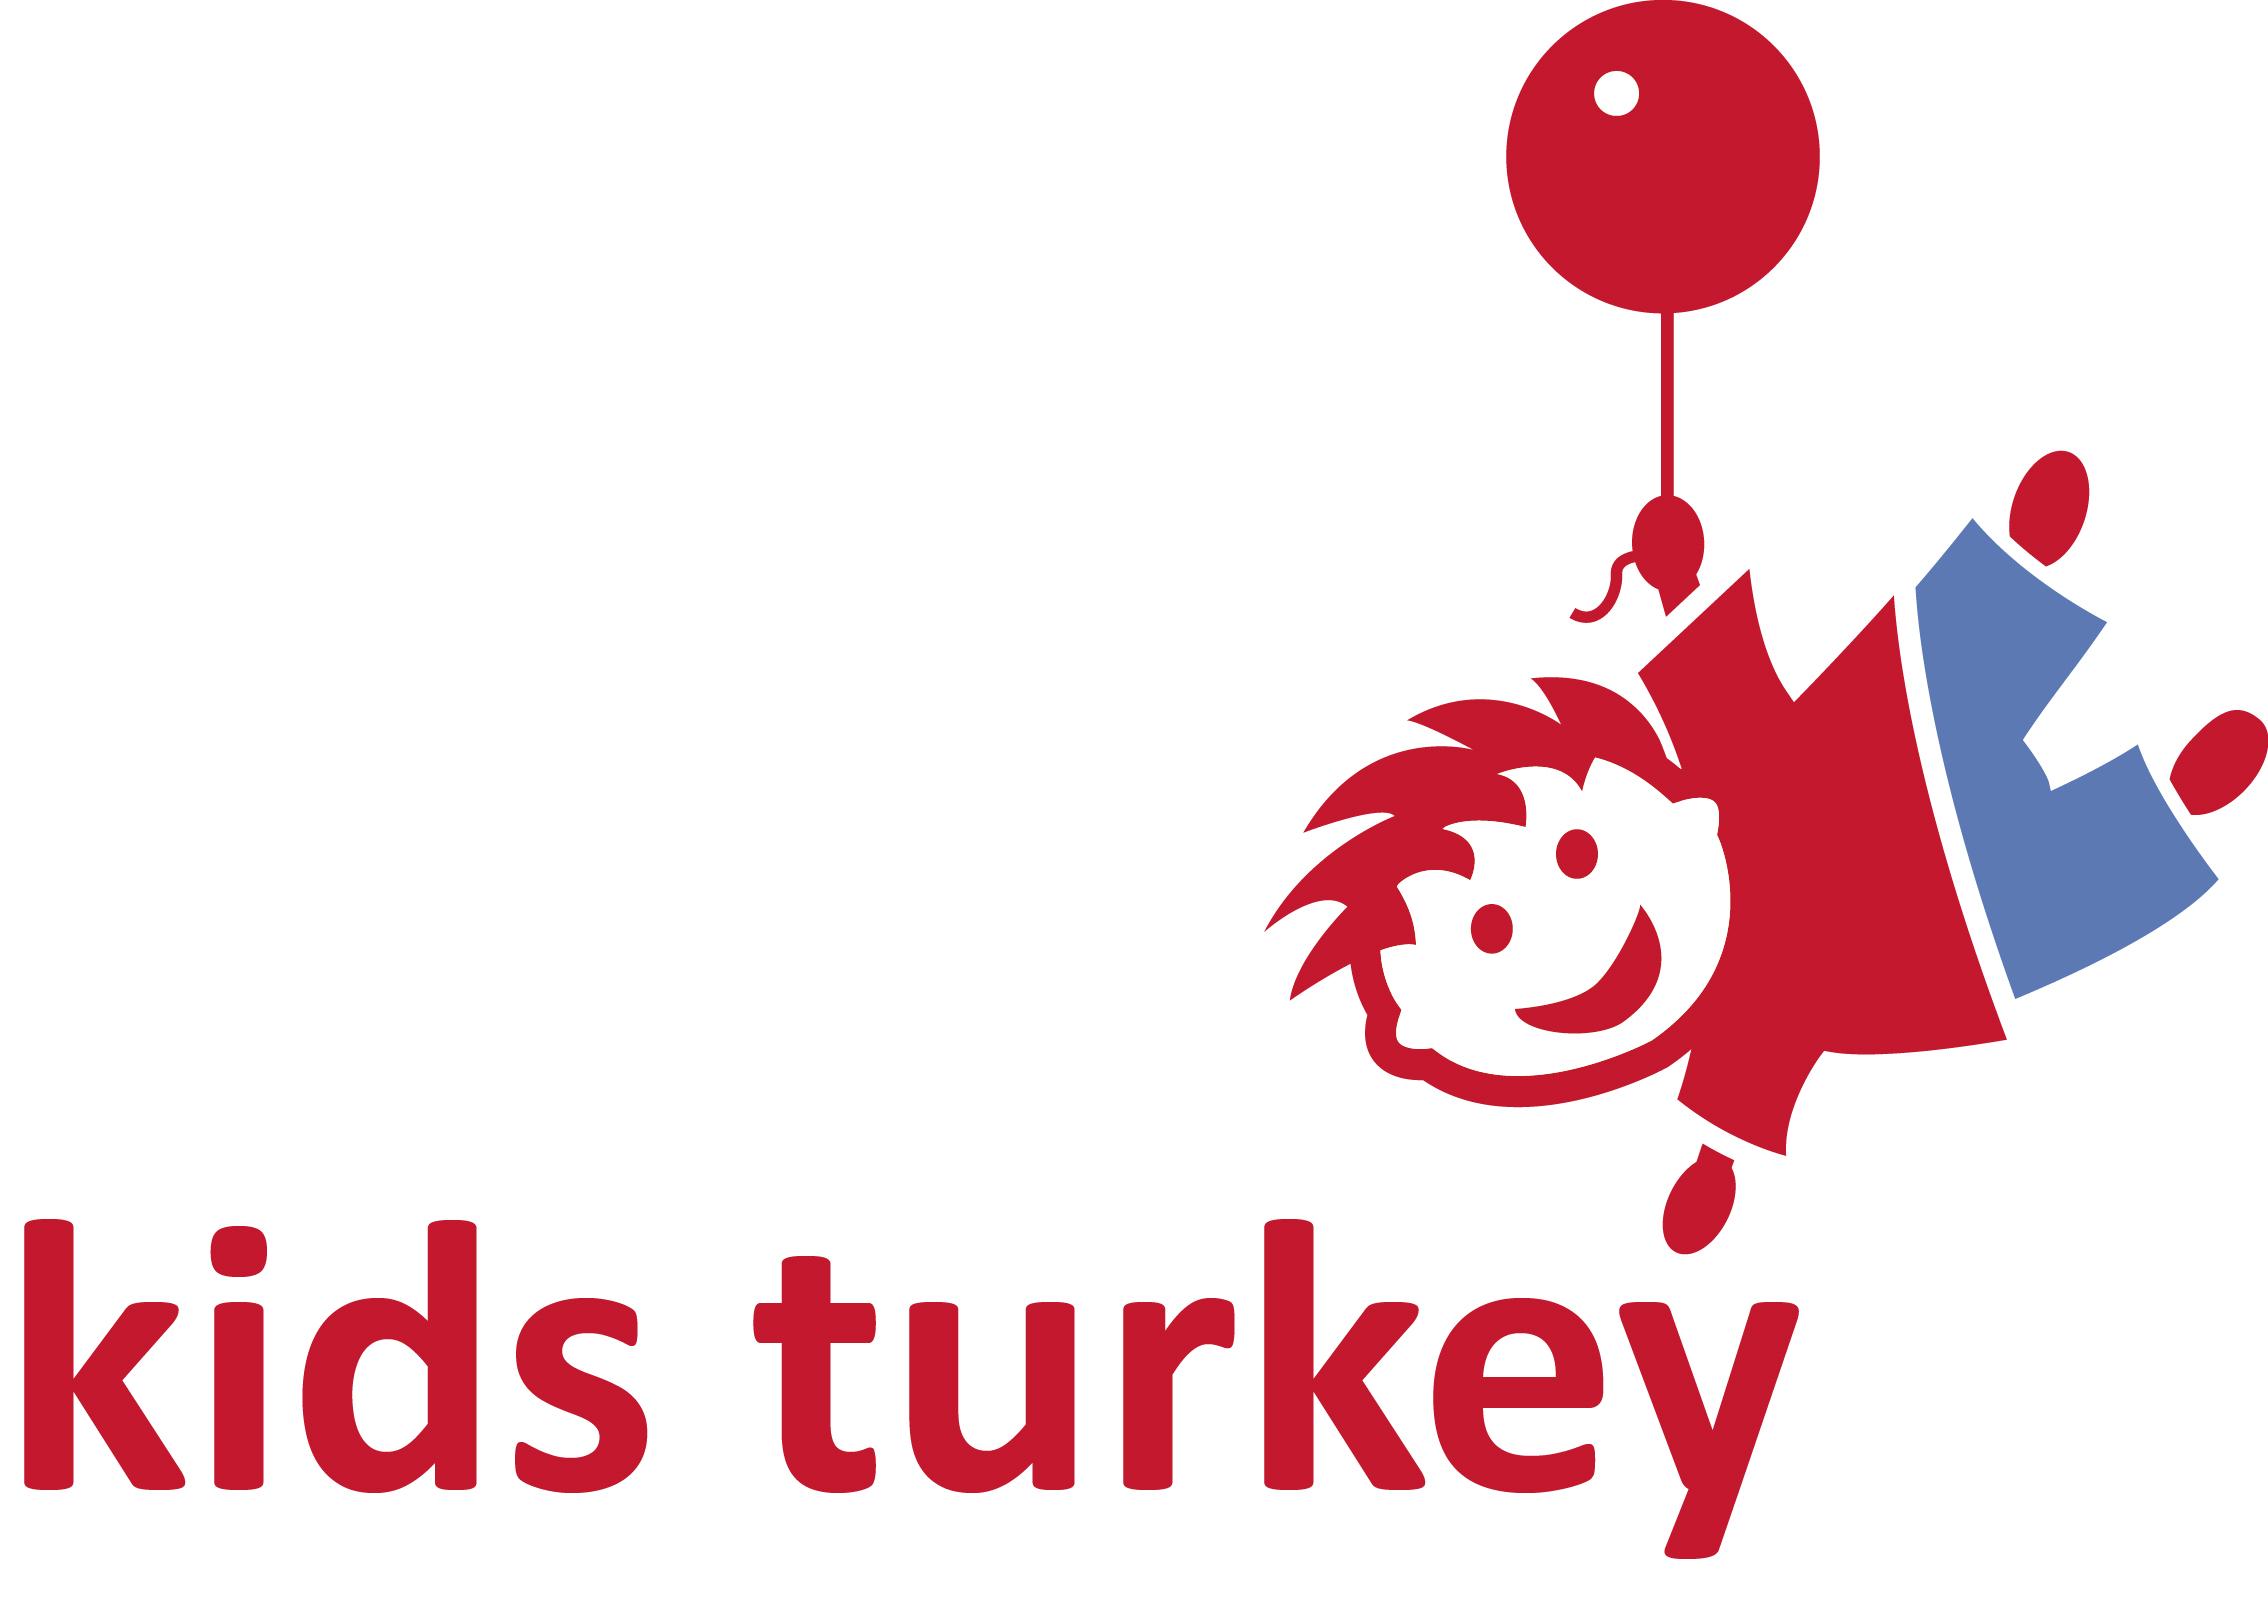 KIDS TURKEY logo